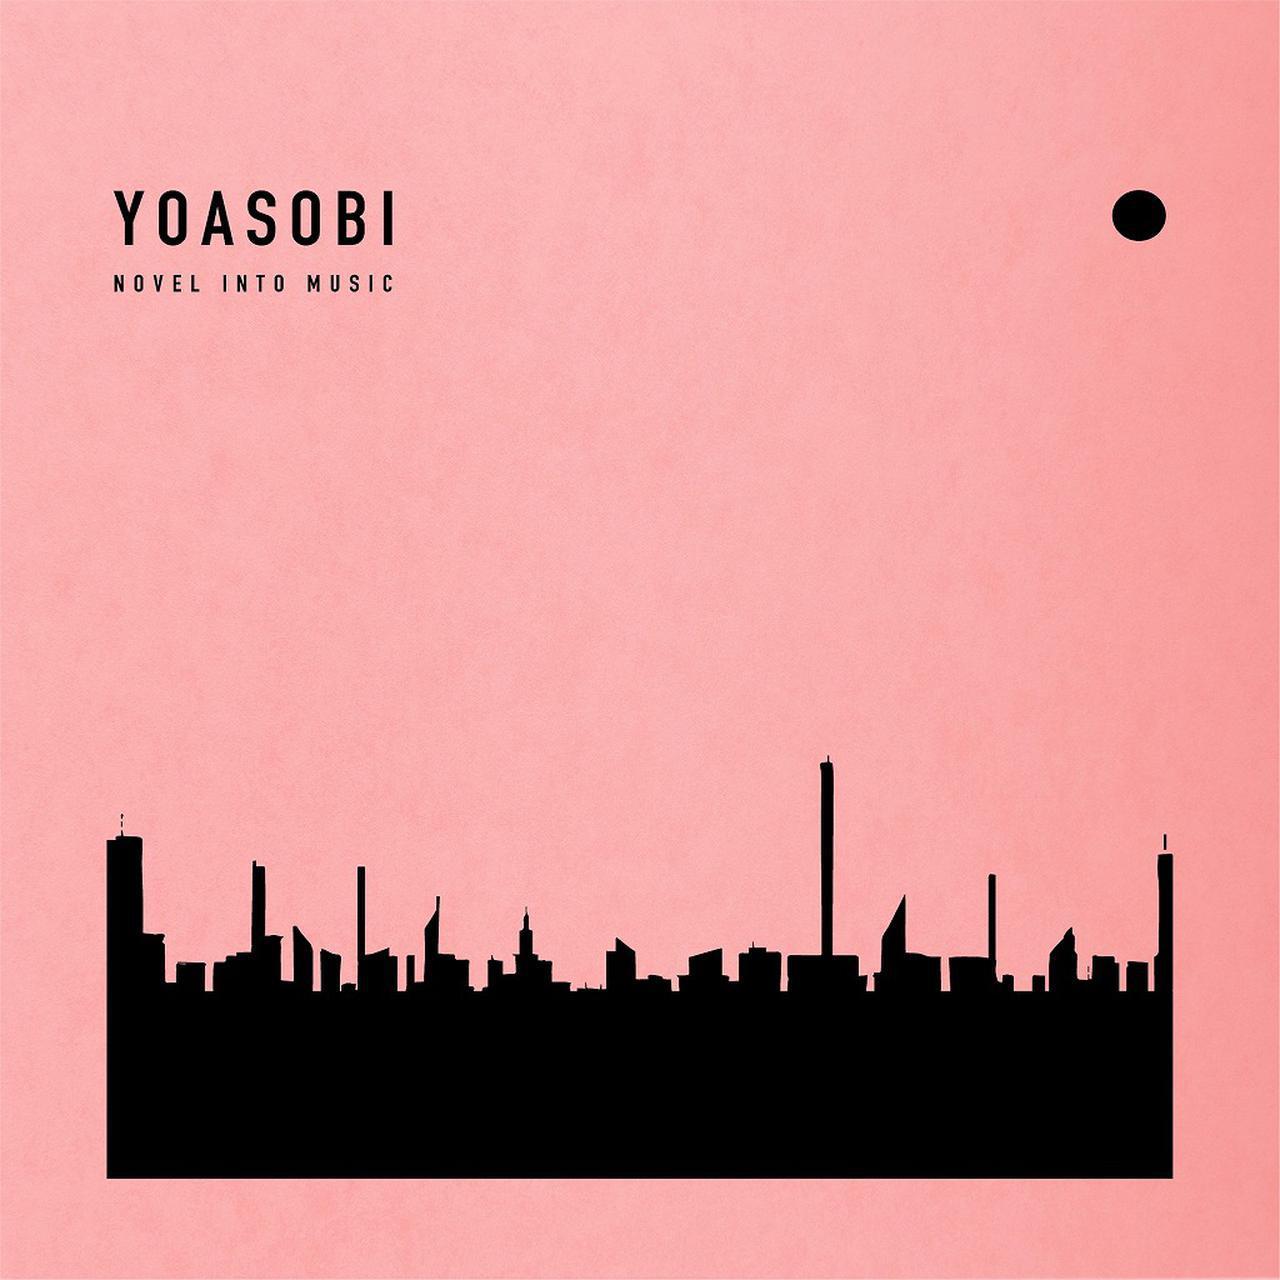 画像: THE BOOK / YOASOBI